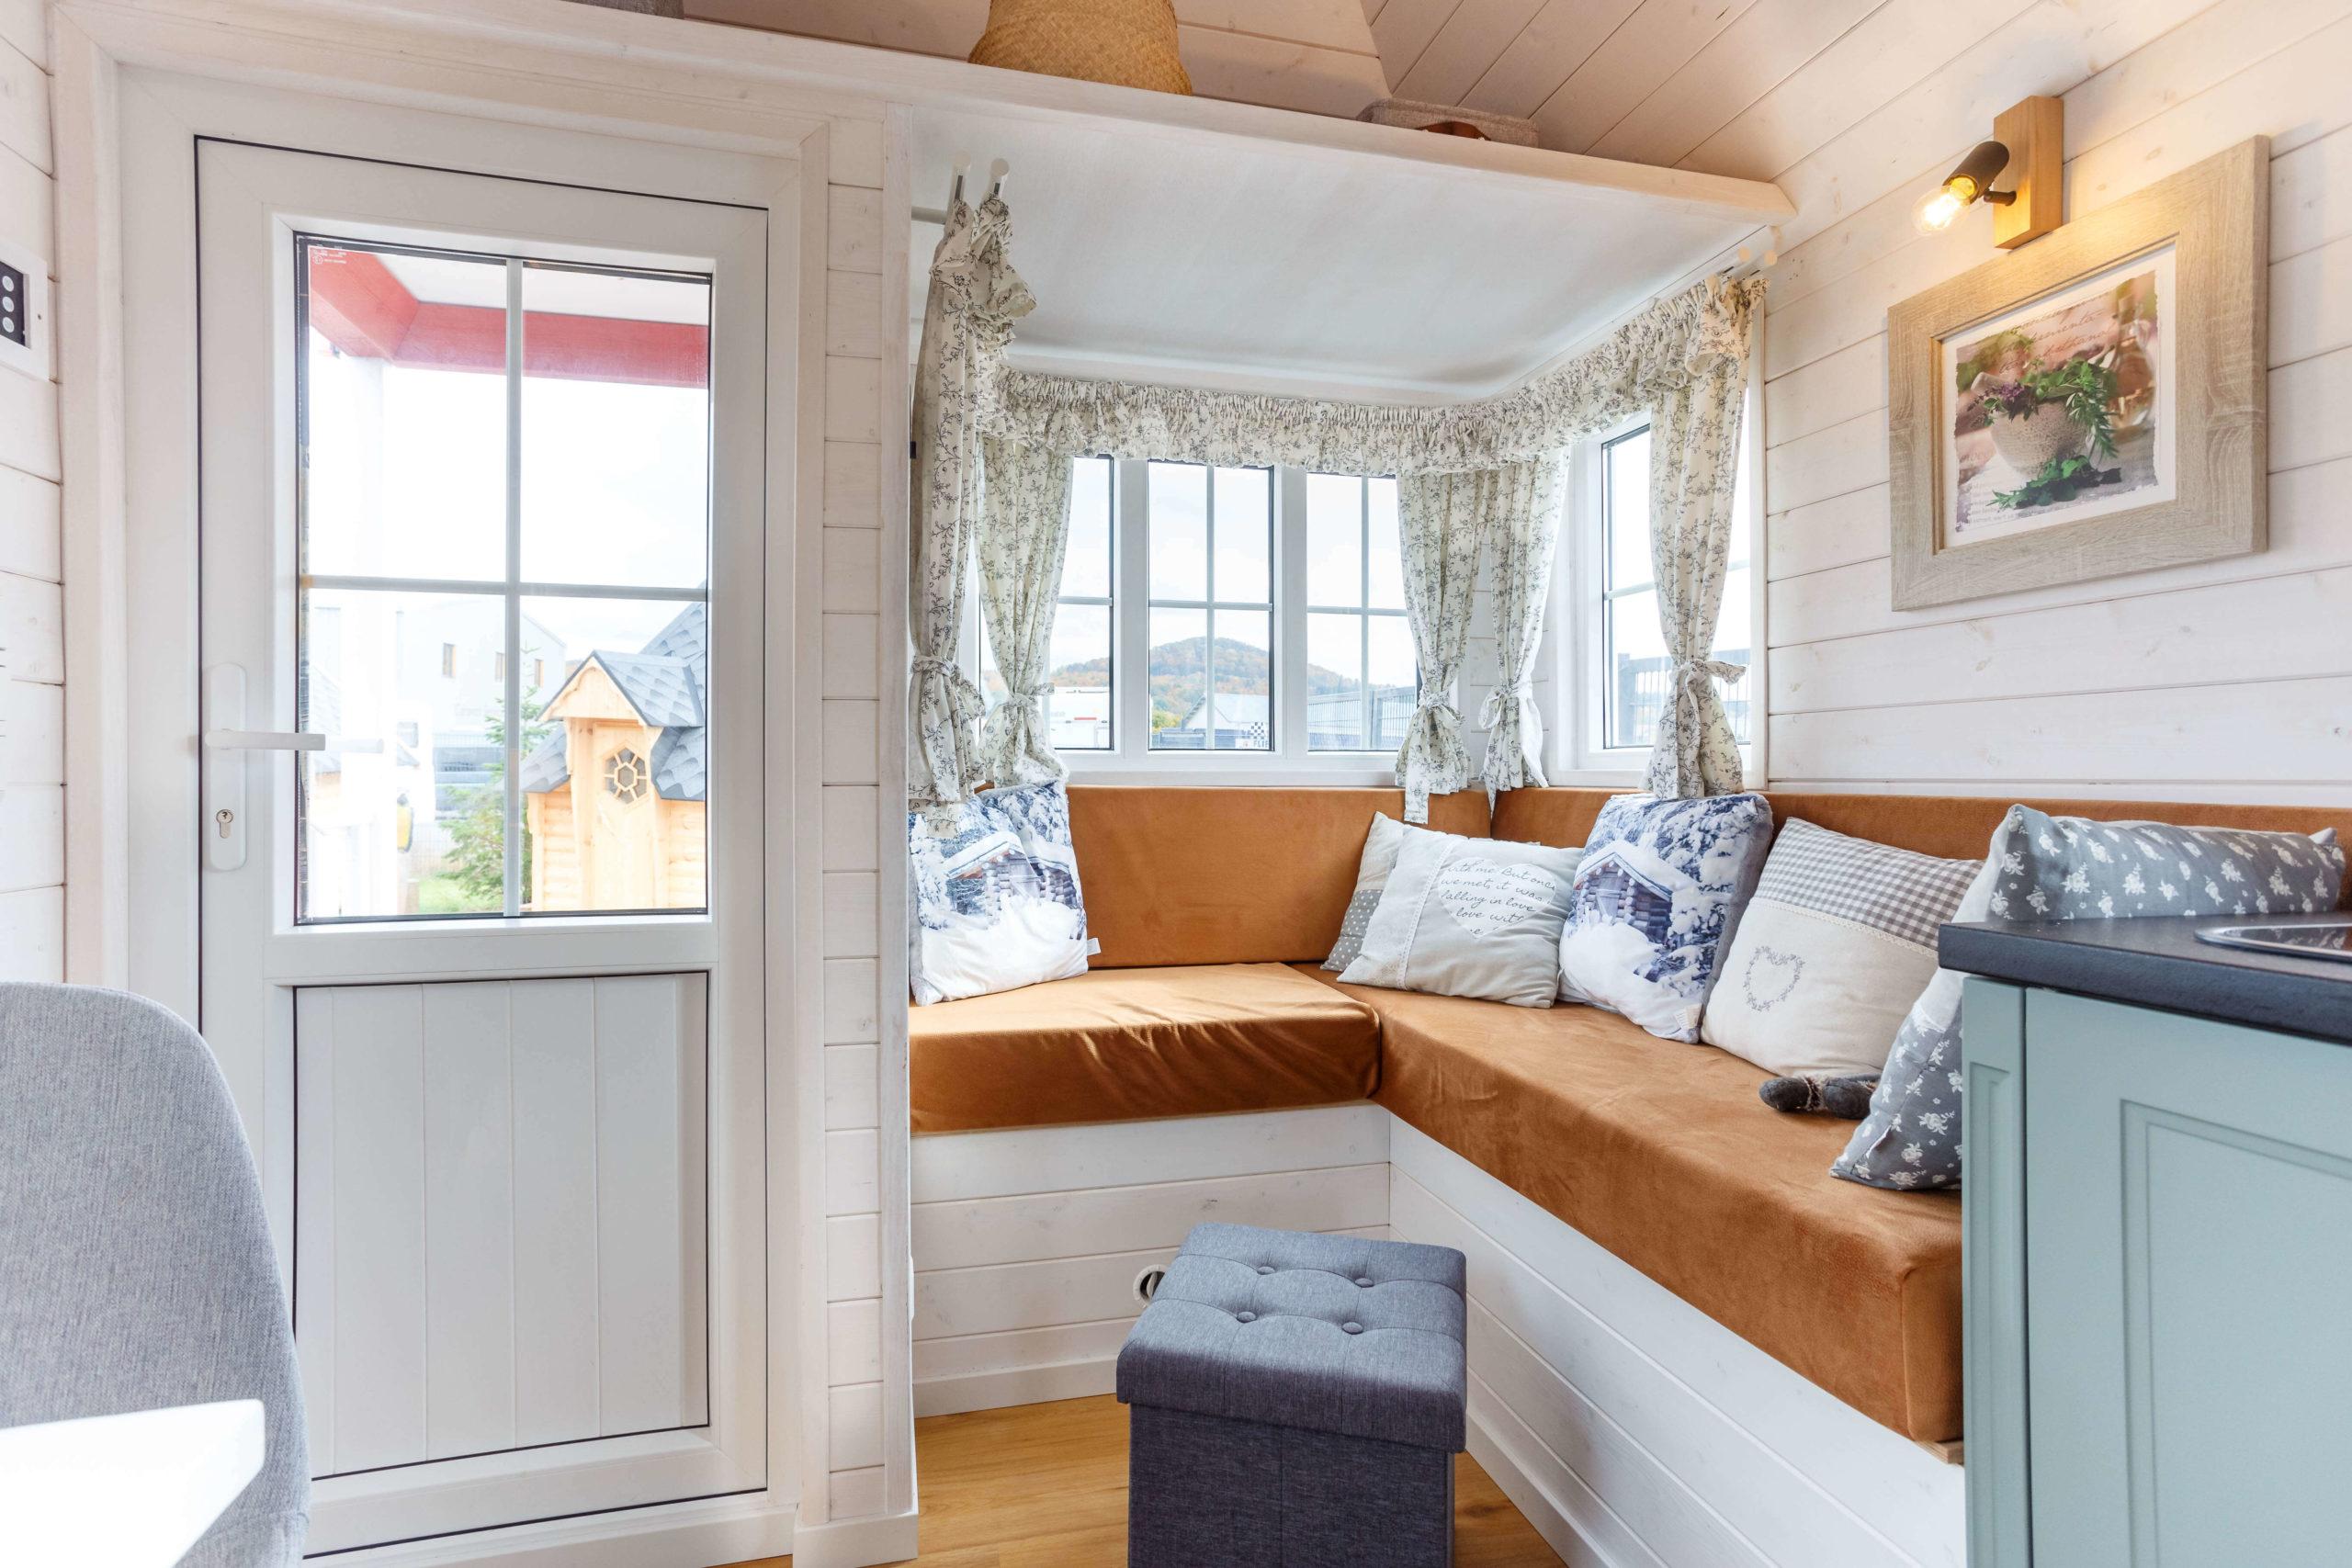 mobiles-tiny-house-schweden-vital-camp-gmbh-15